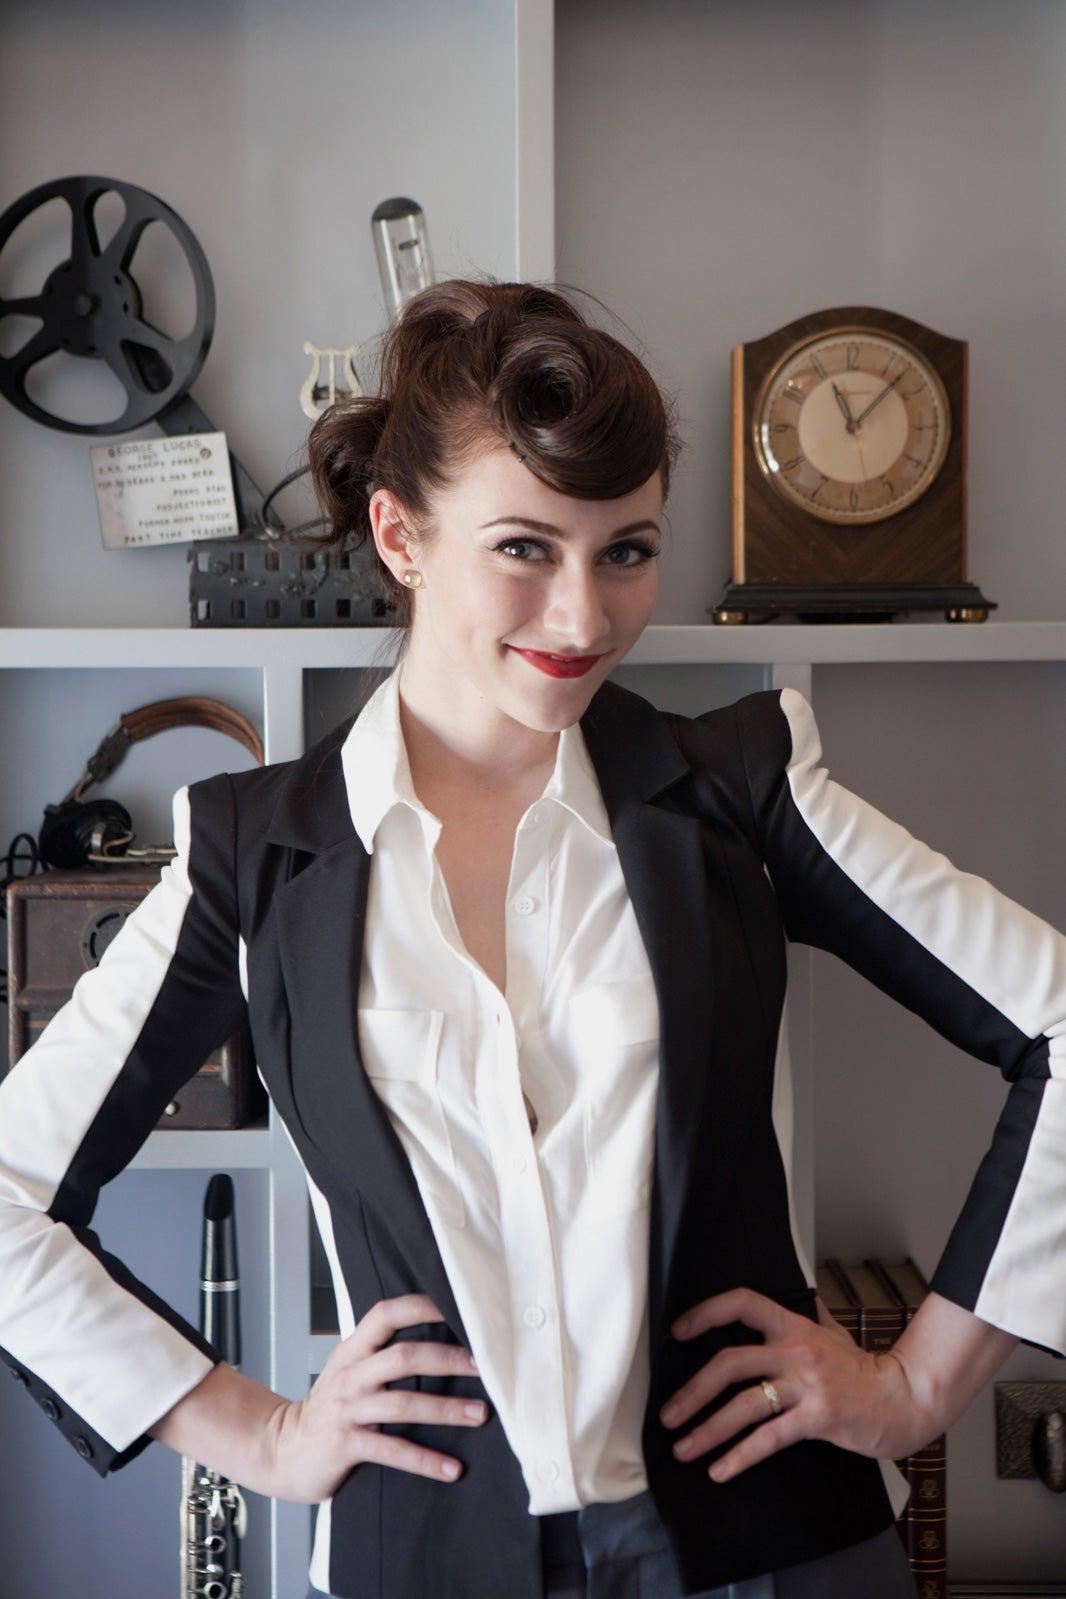 karmin styleamy heidemann models her retrobabe style and